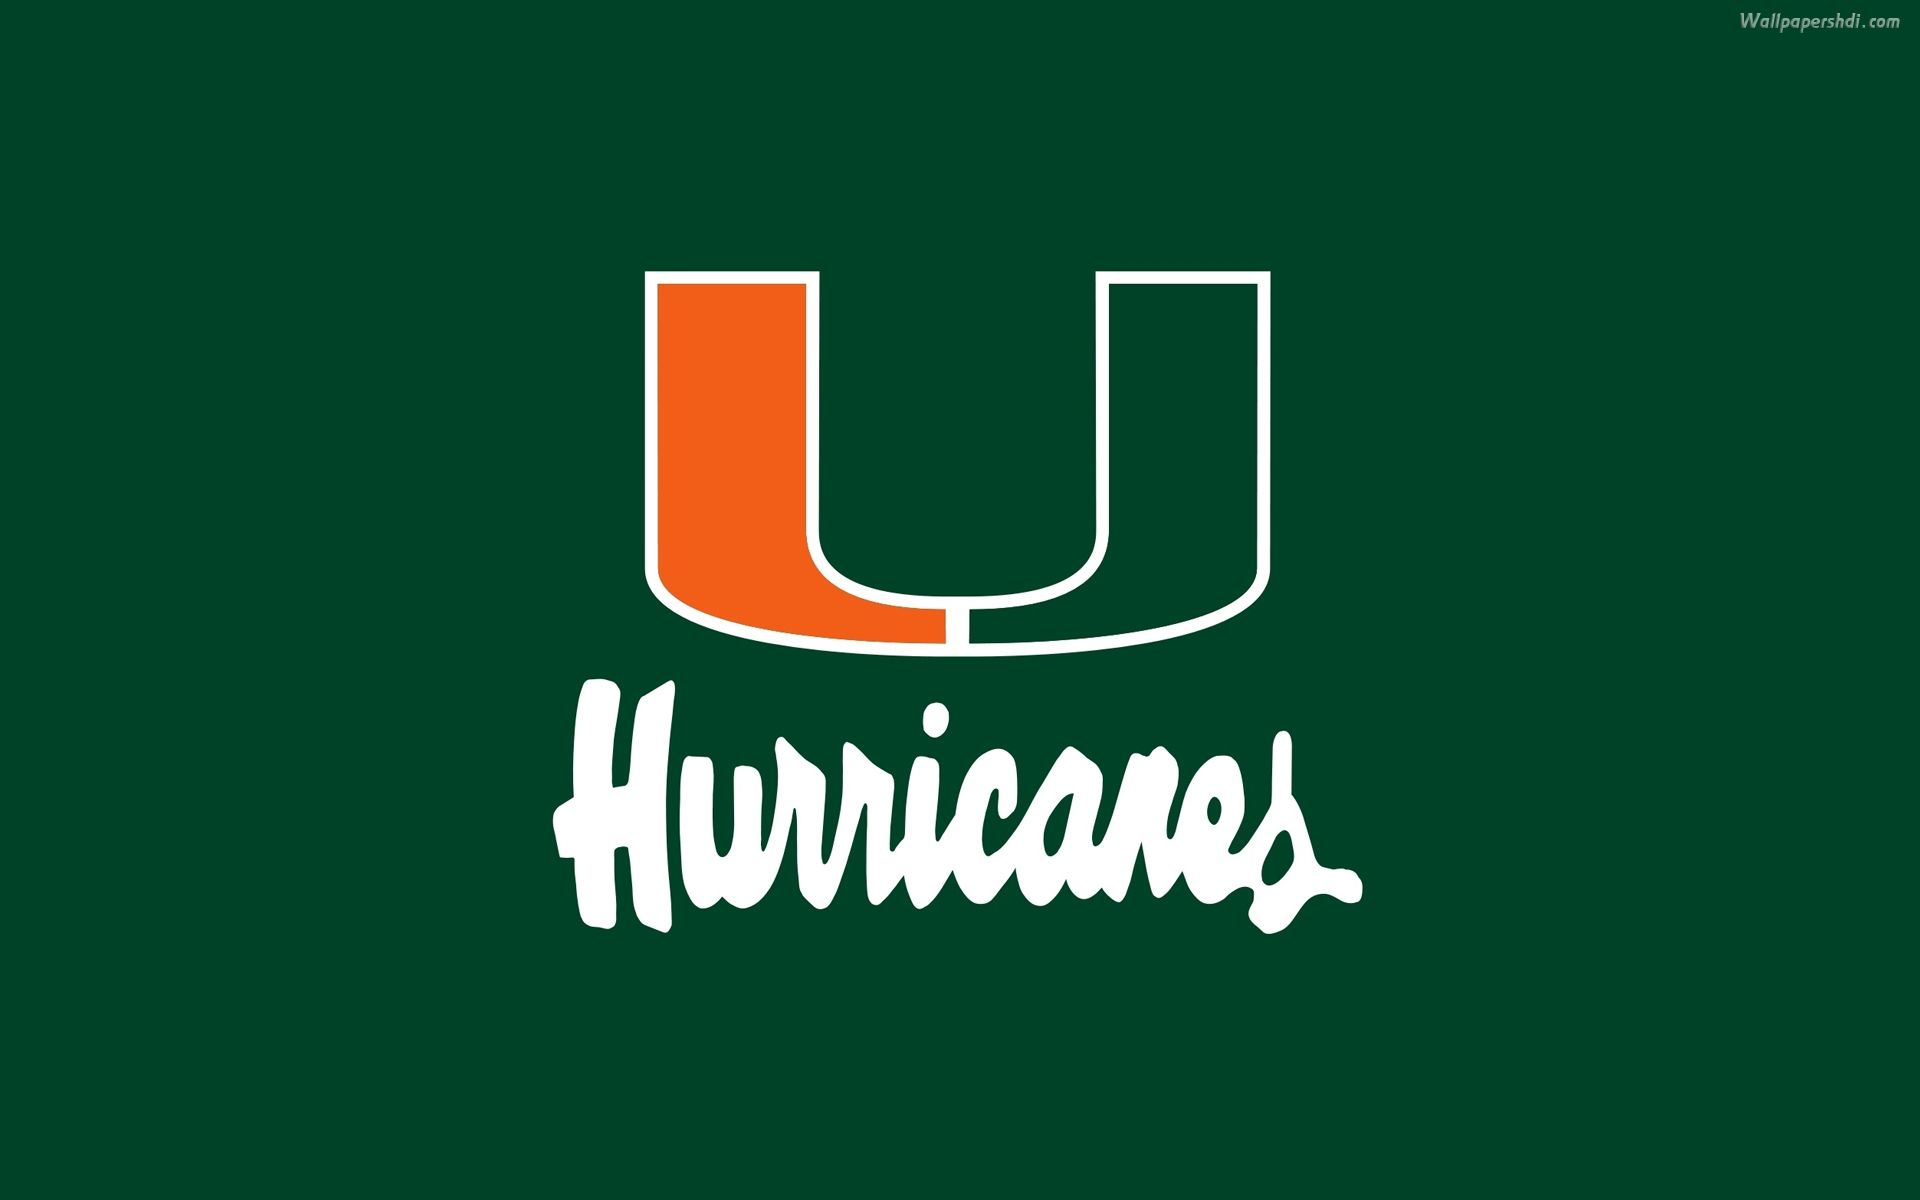 Miami Hurricanes Football Wallpaper